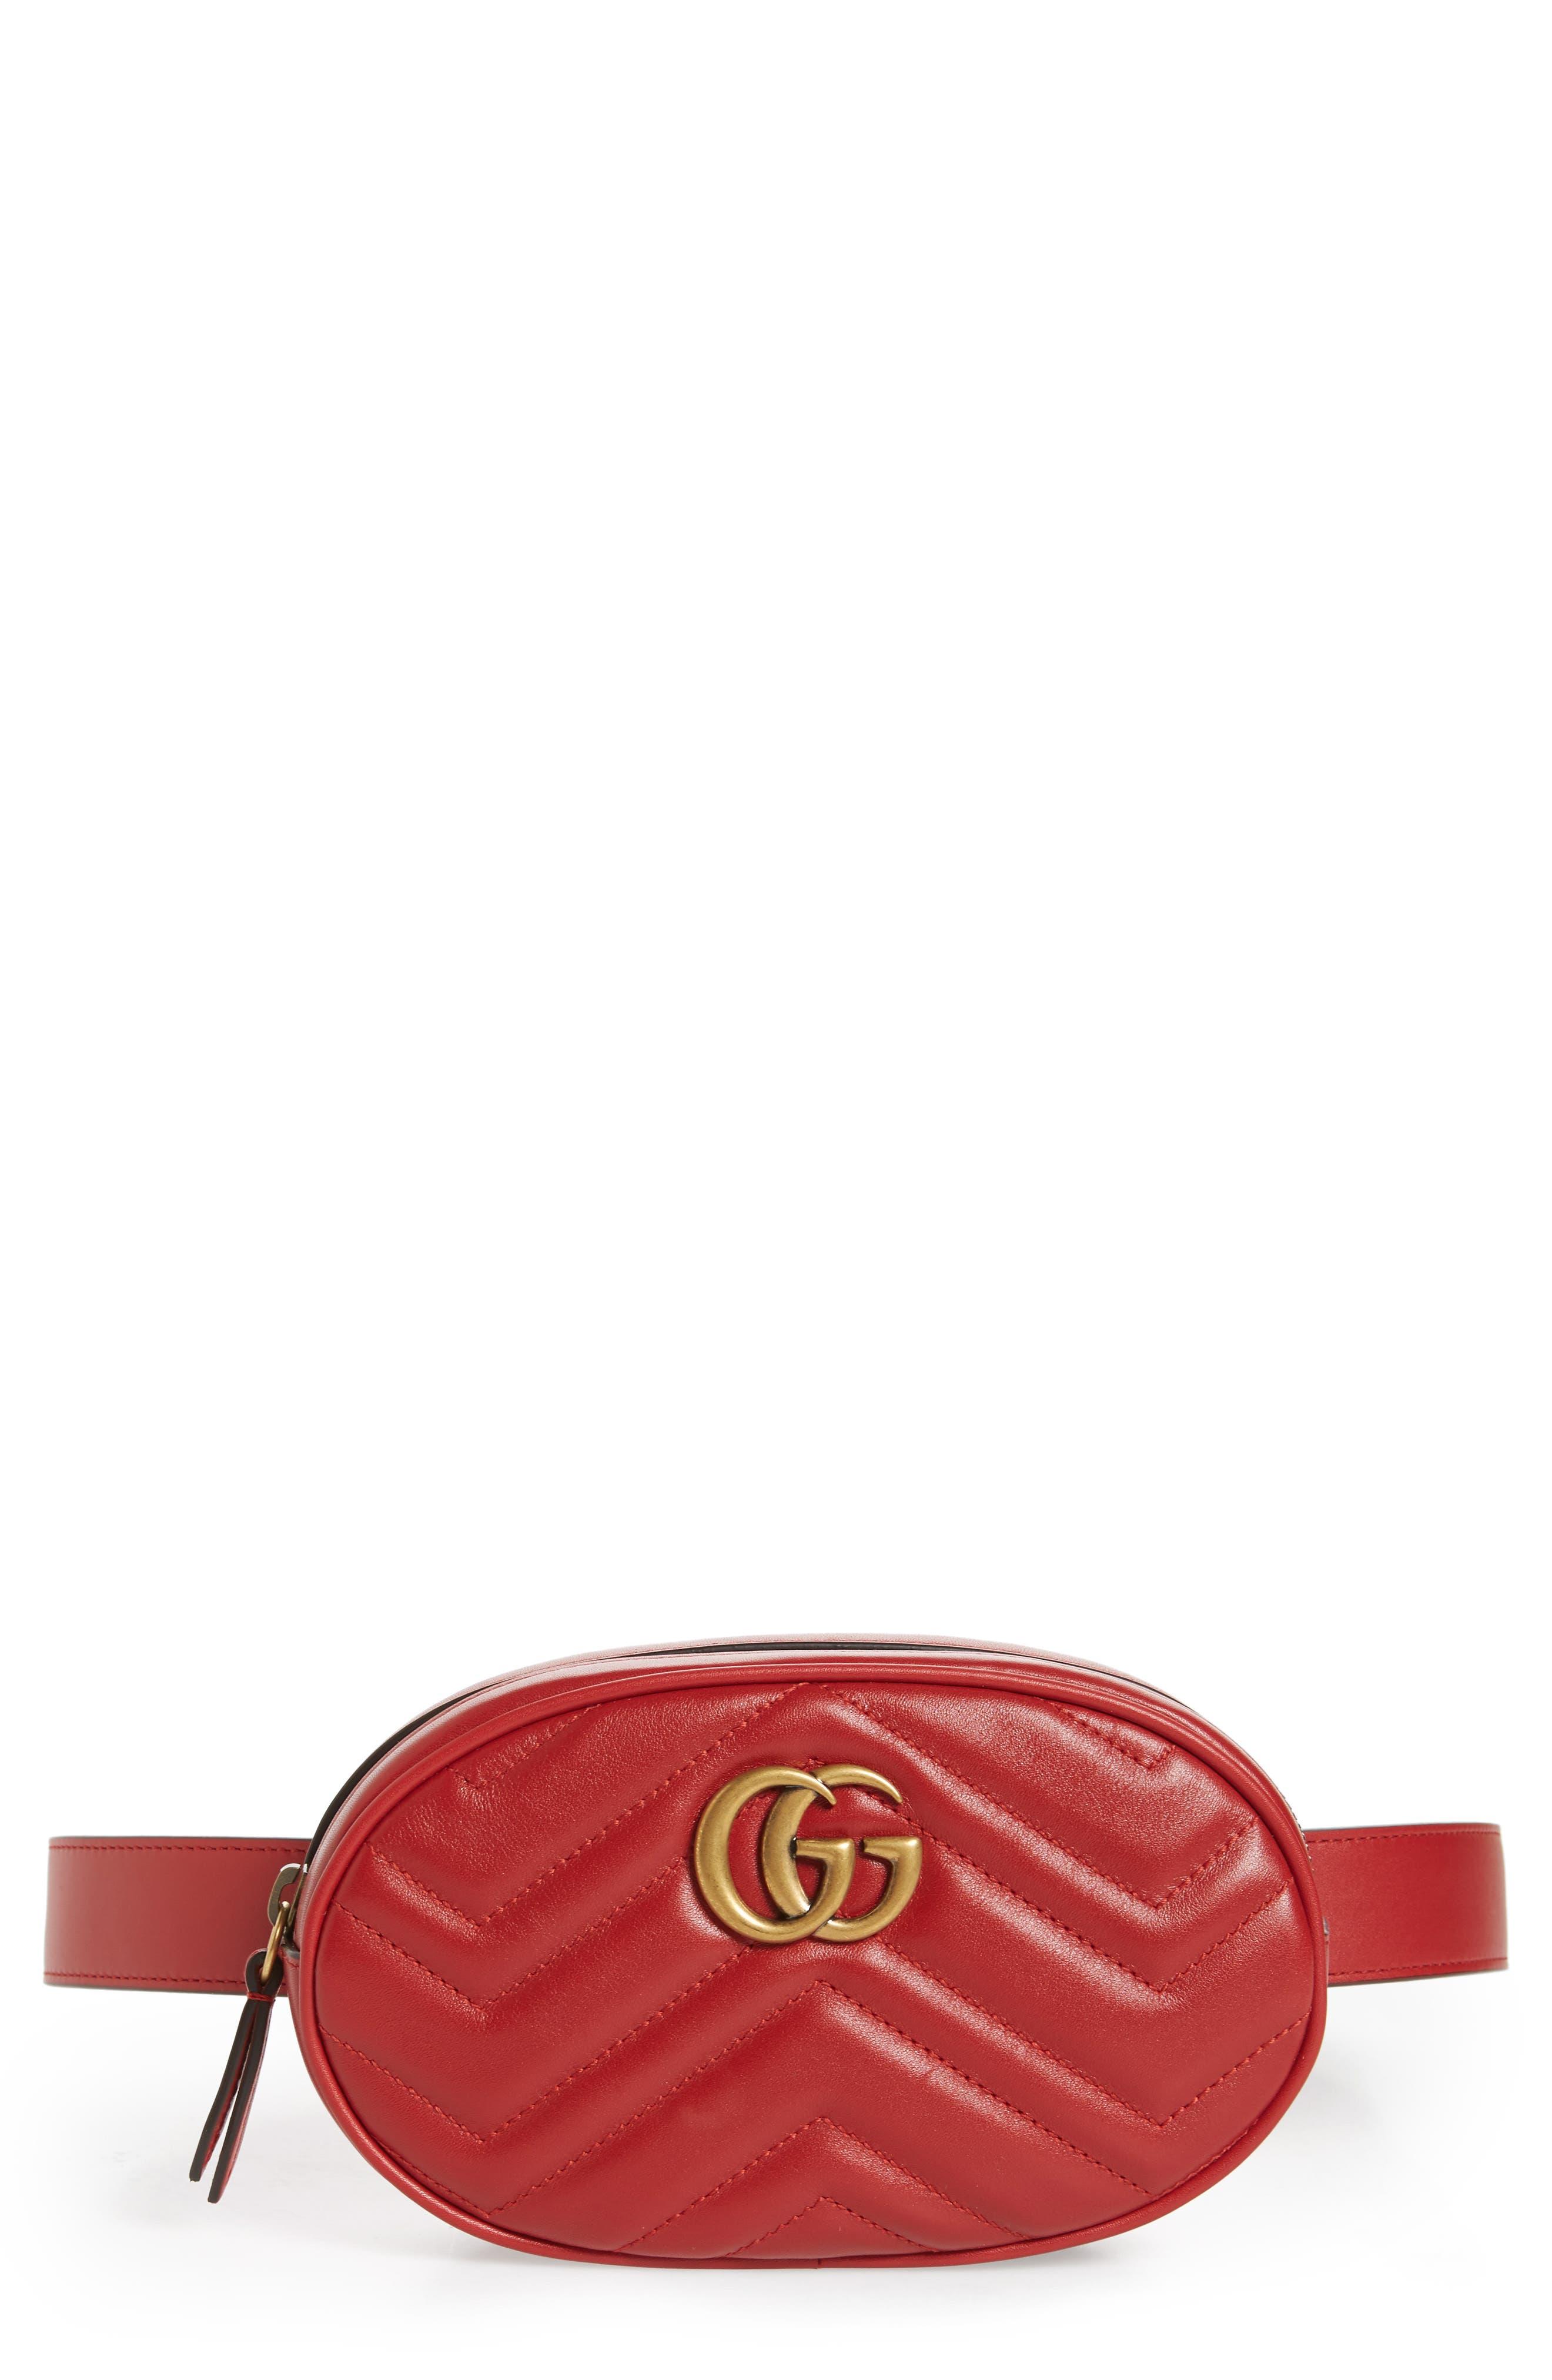 056c49b620d Gucci marmont matelassé leather belt bag main color hibiscus red jpg  780x838 Red gucci belt bag